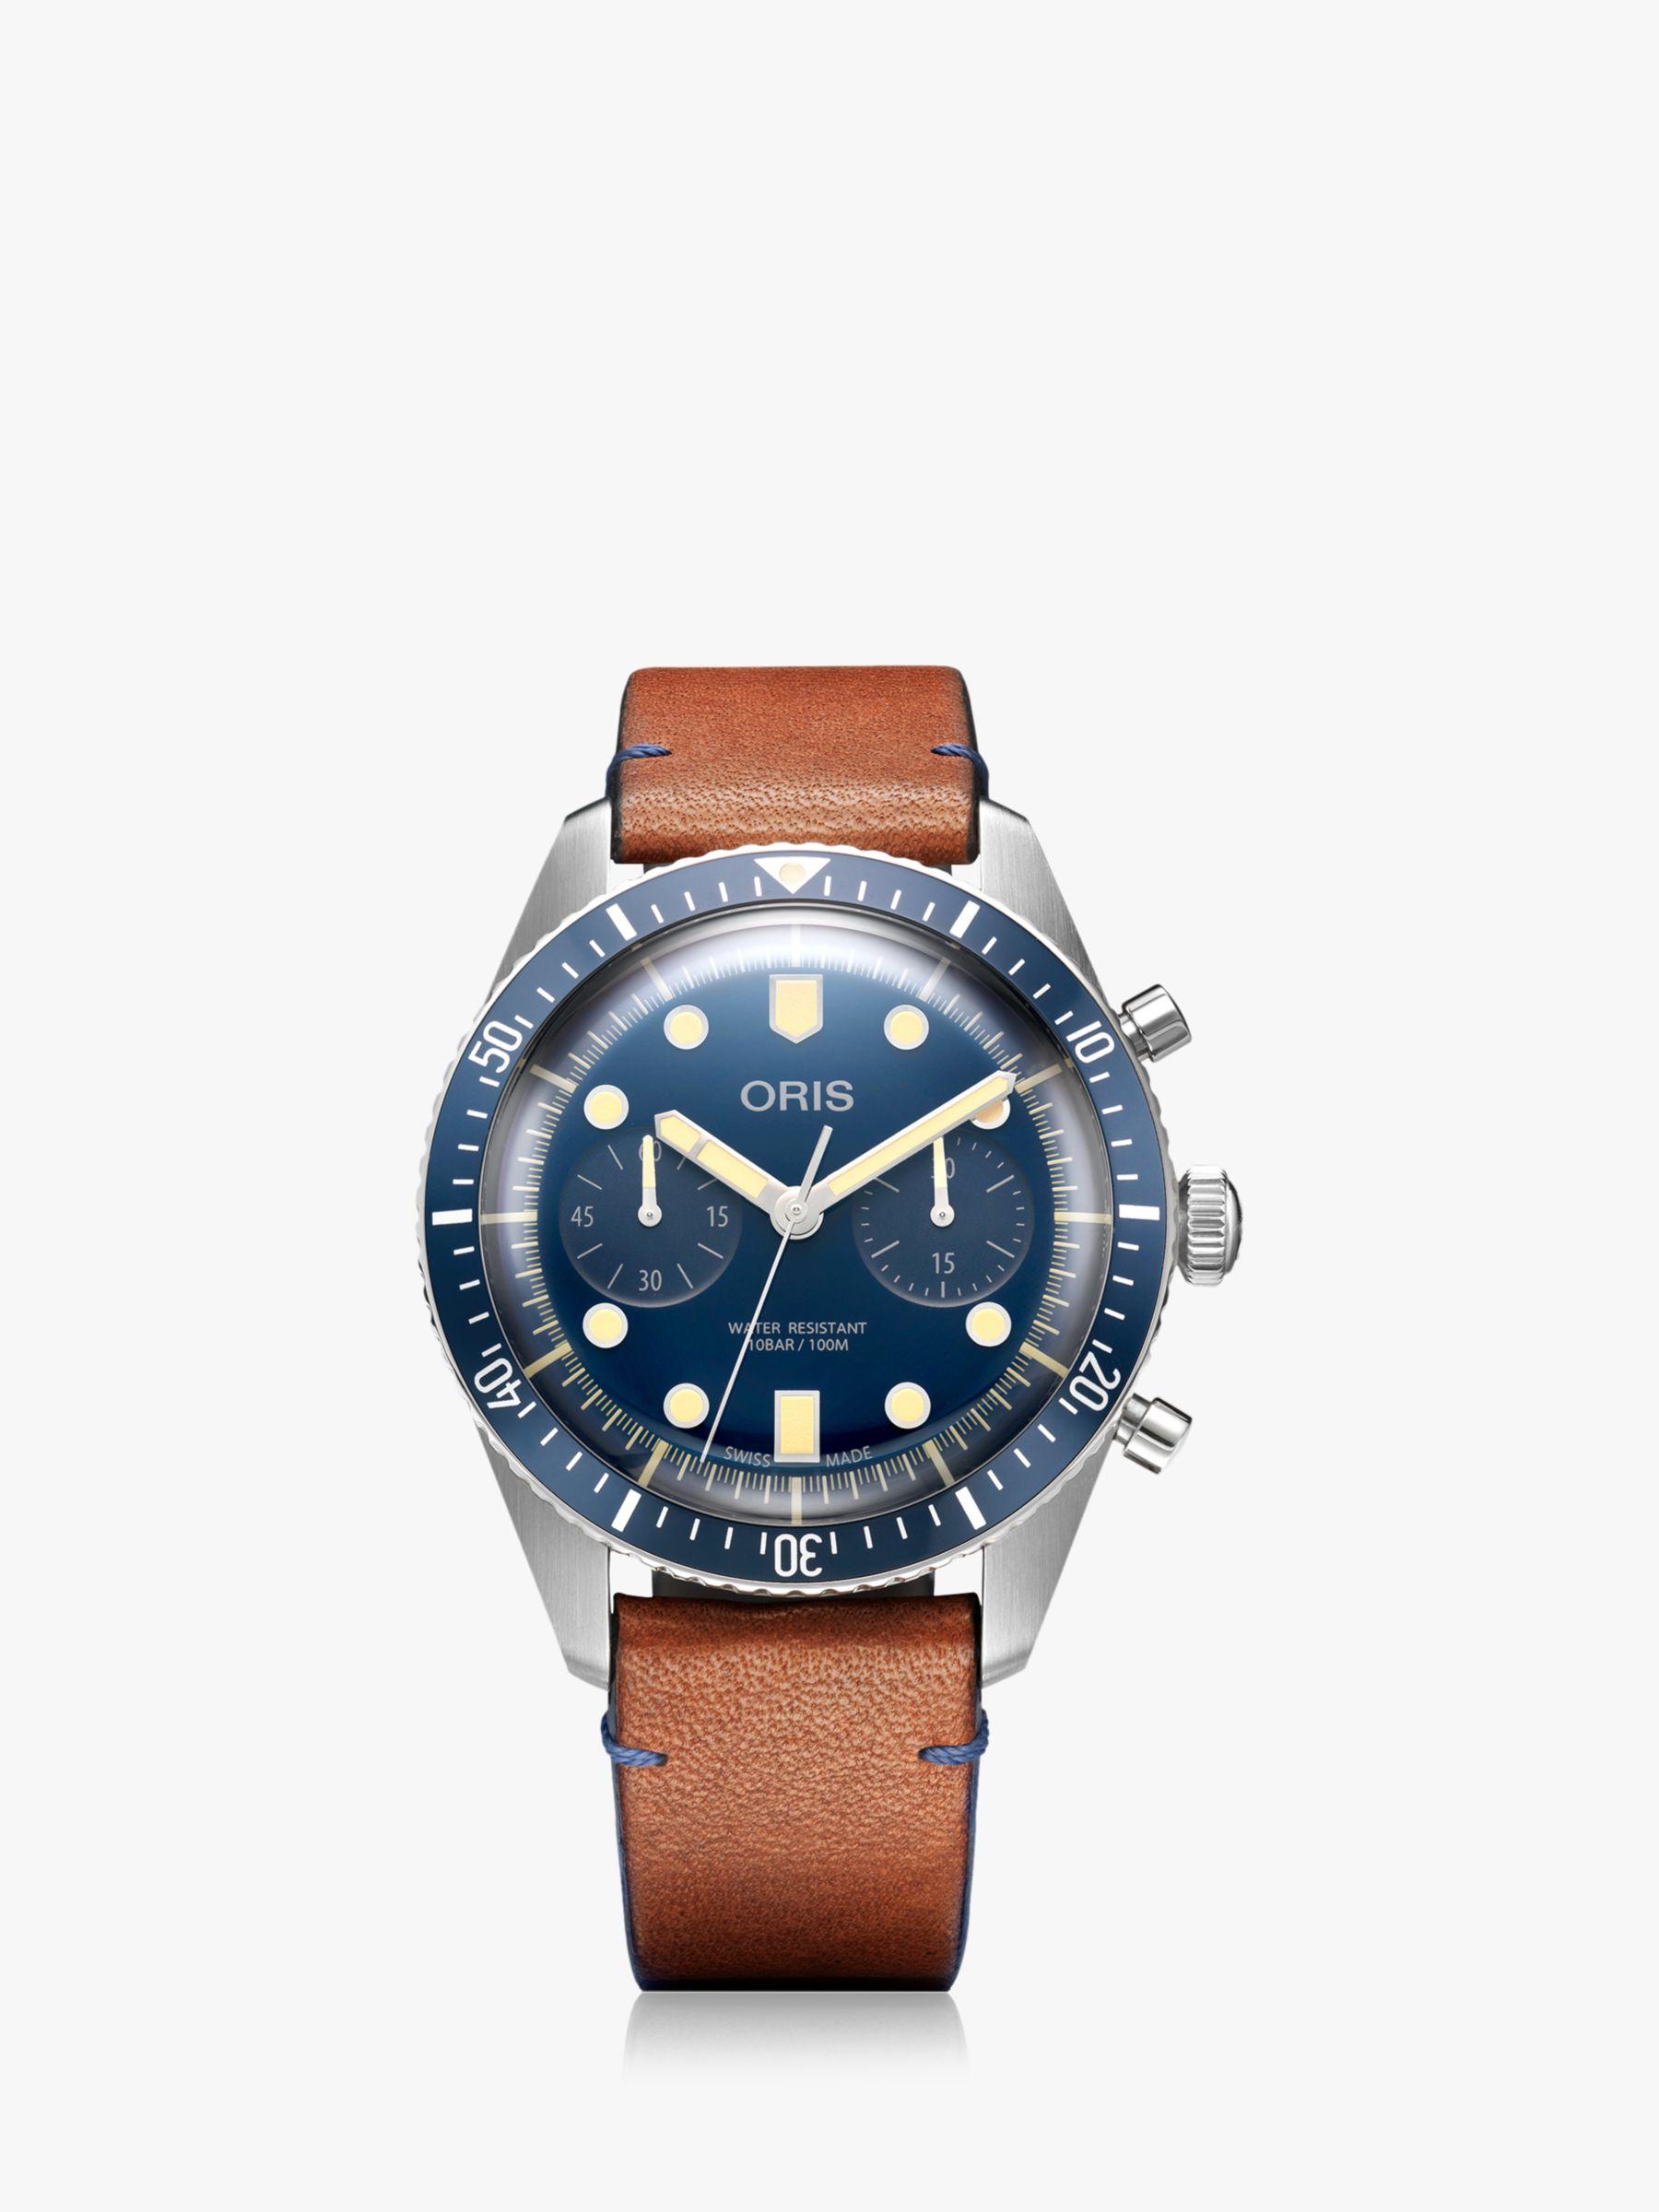 Oris Oris 01 771 7744 4095 Men's Divers Sixty-Five Bucherer Blue Edition Automatic Chronograph Leather Strap Watch, Tan/Navy